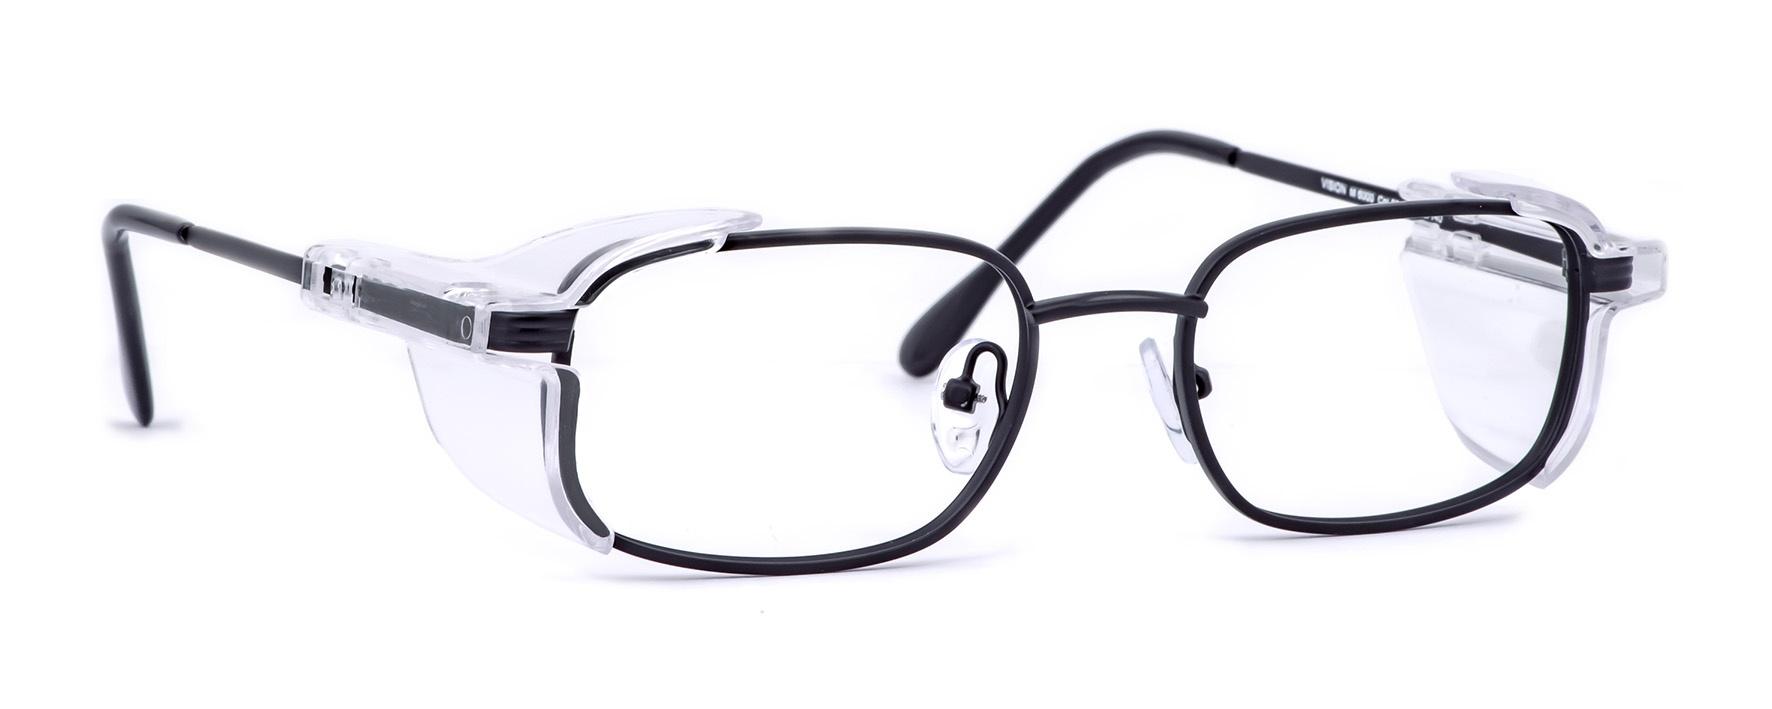 VISION M6000 6000-03-5200 (BLACK)